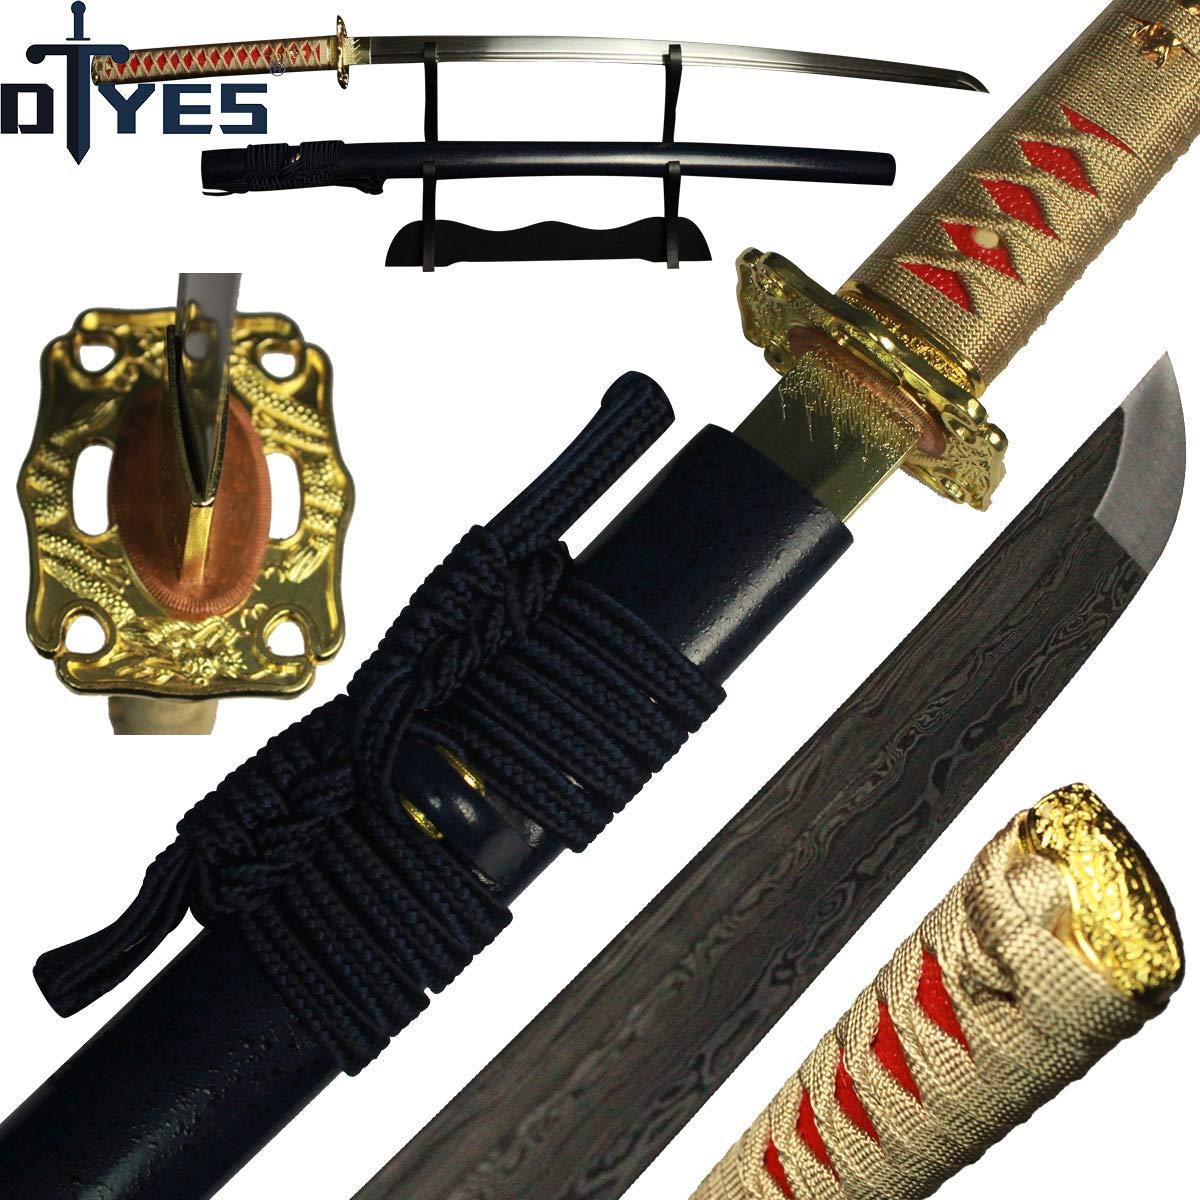 Furniture Creations Renaissance Dagger Style Scissors With Sheath